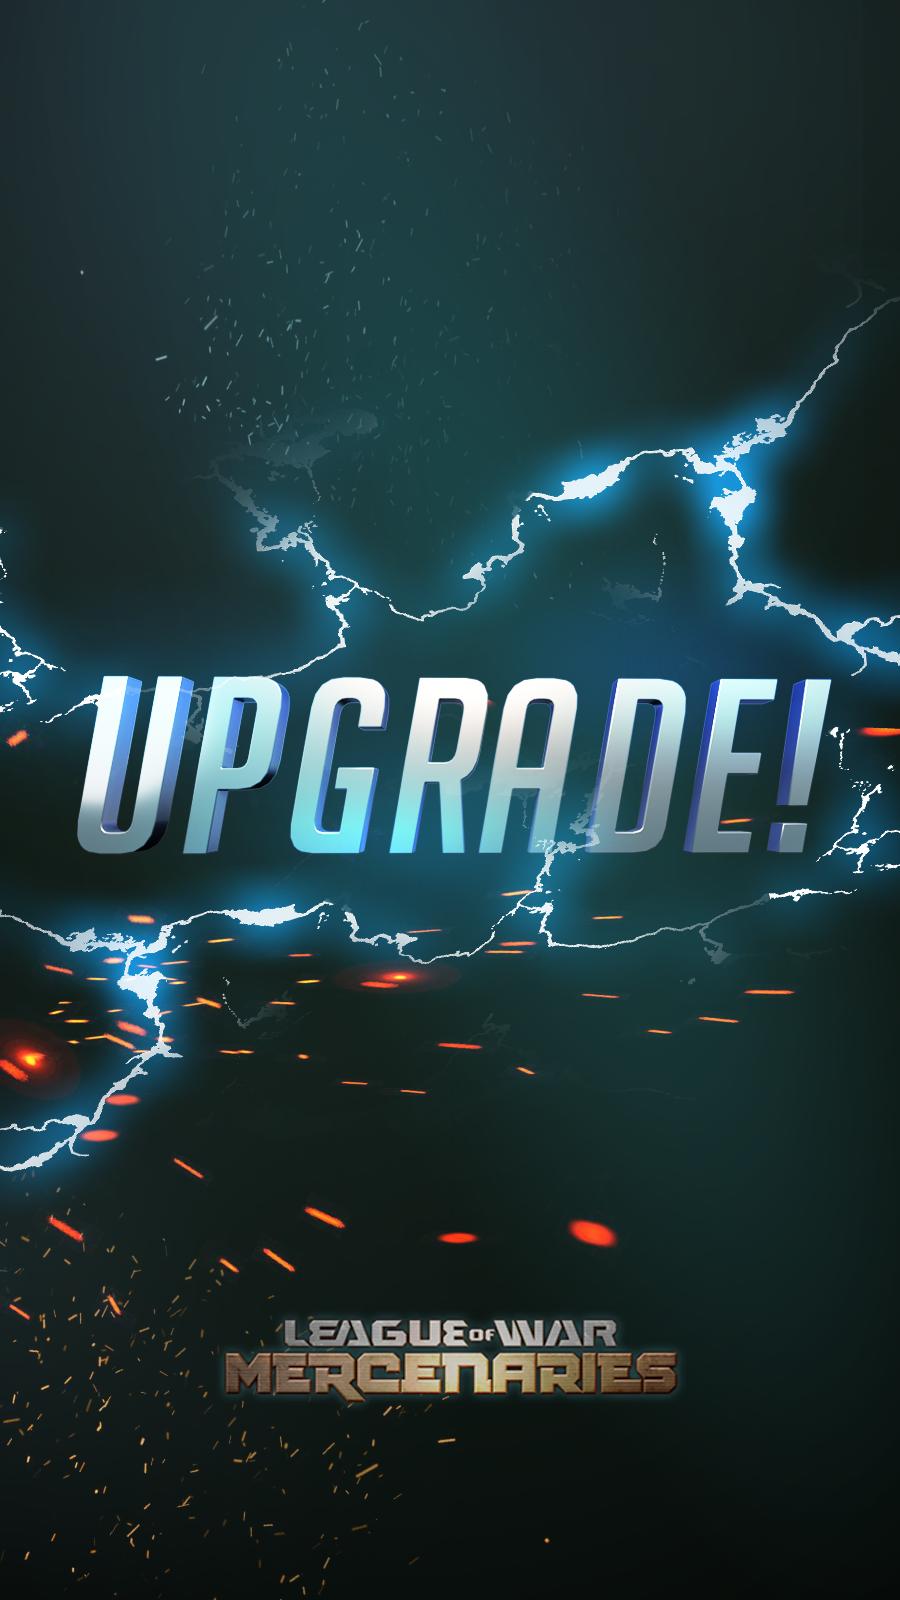 Shot_UpgradeText_HeaderFooter.png